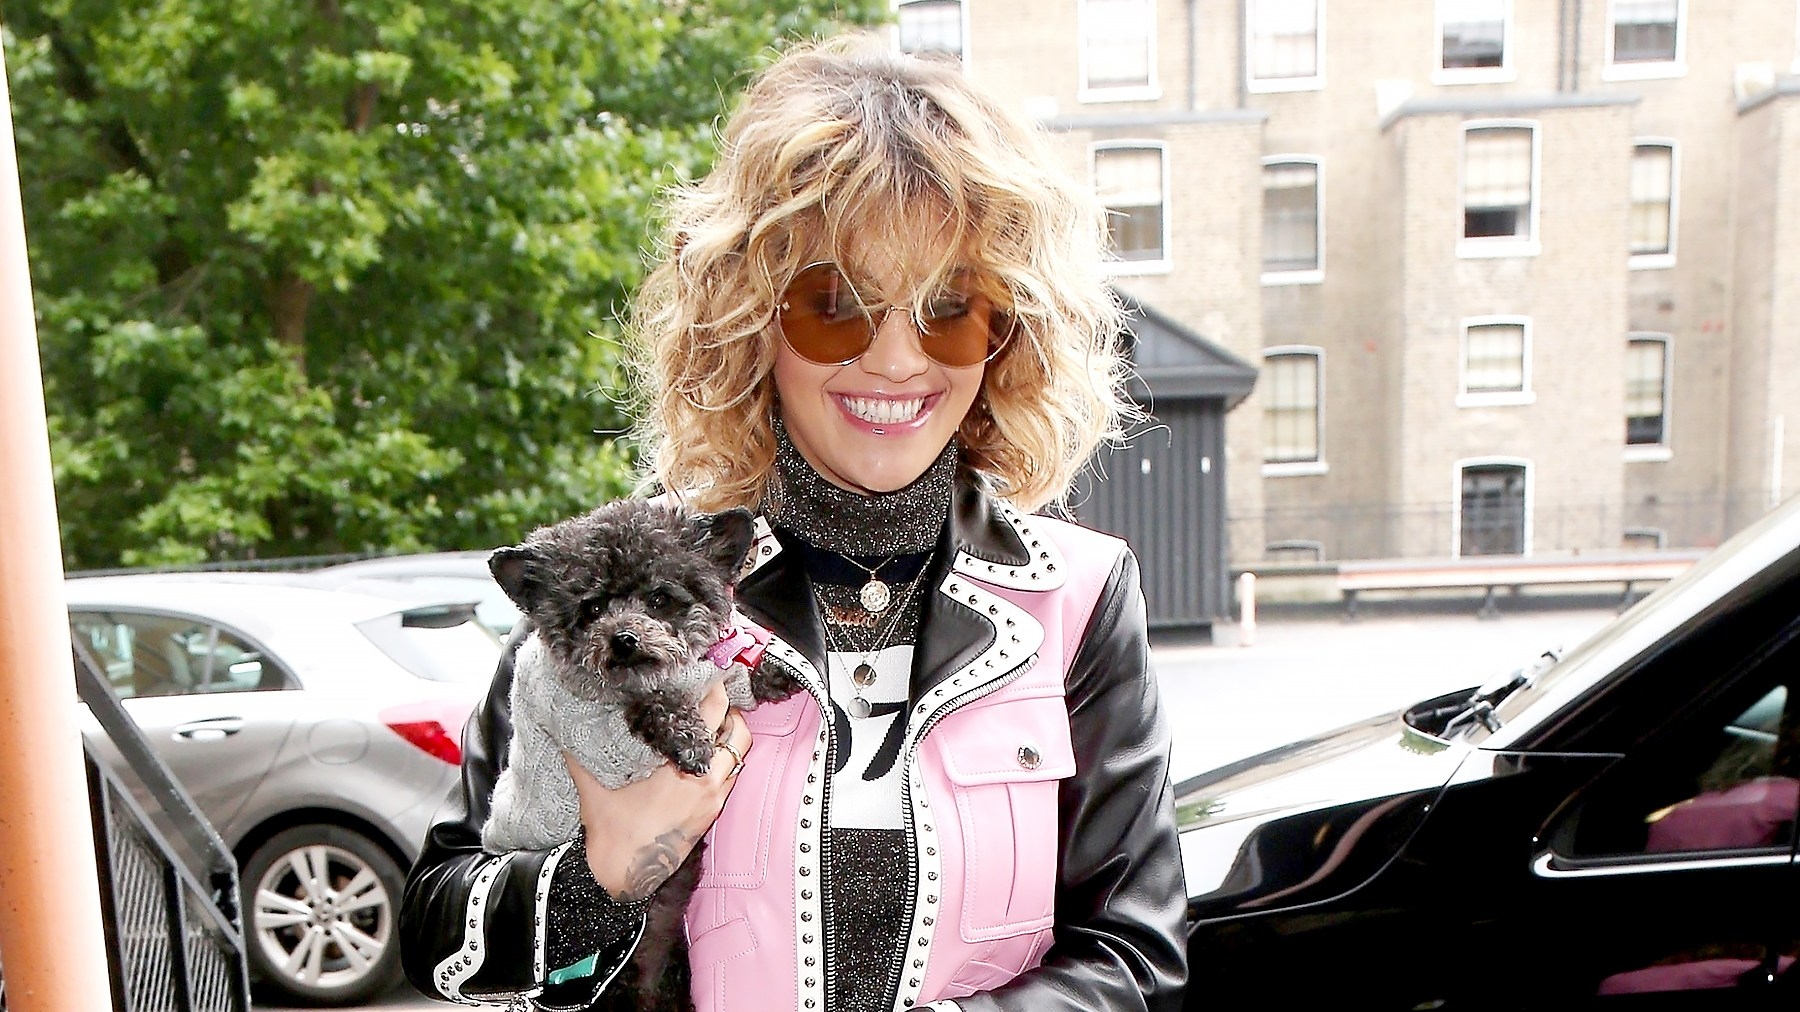 Rita Ora and her dog